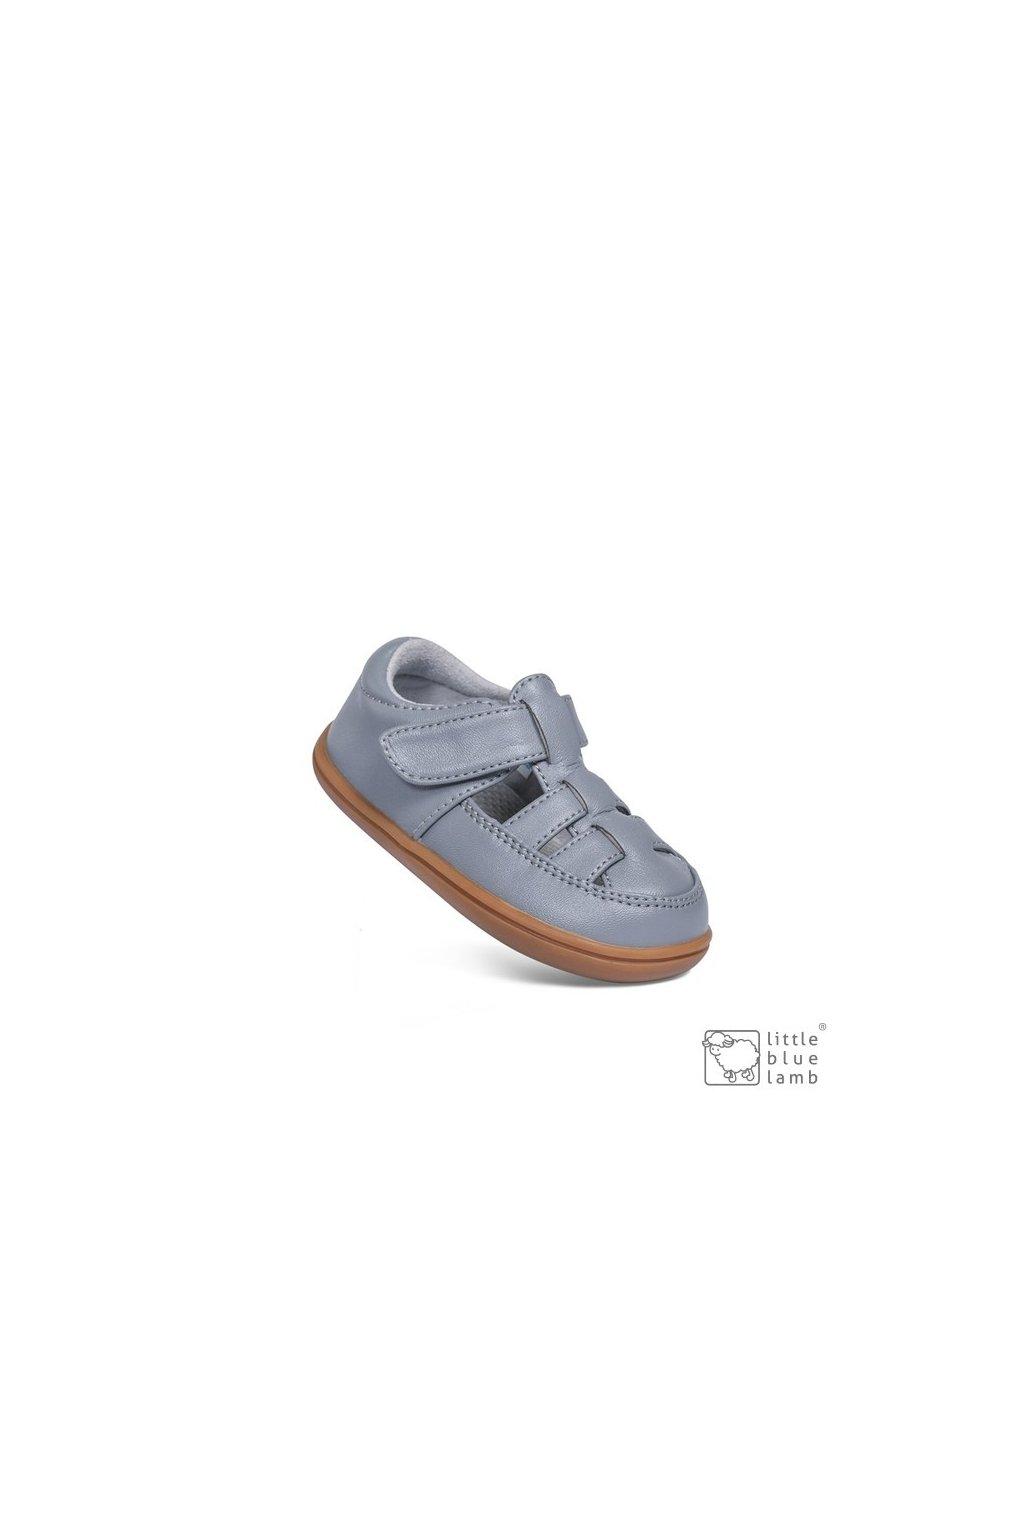 LbL- Berny Grey